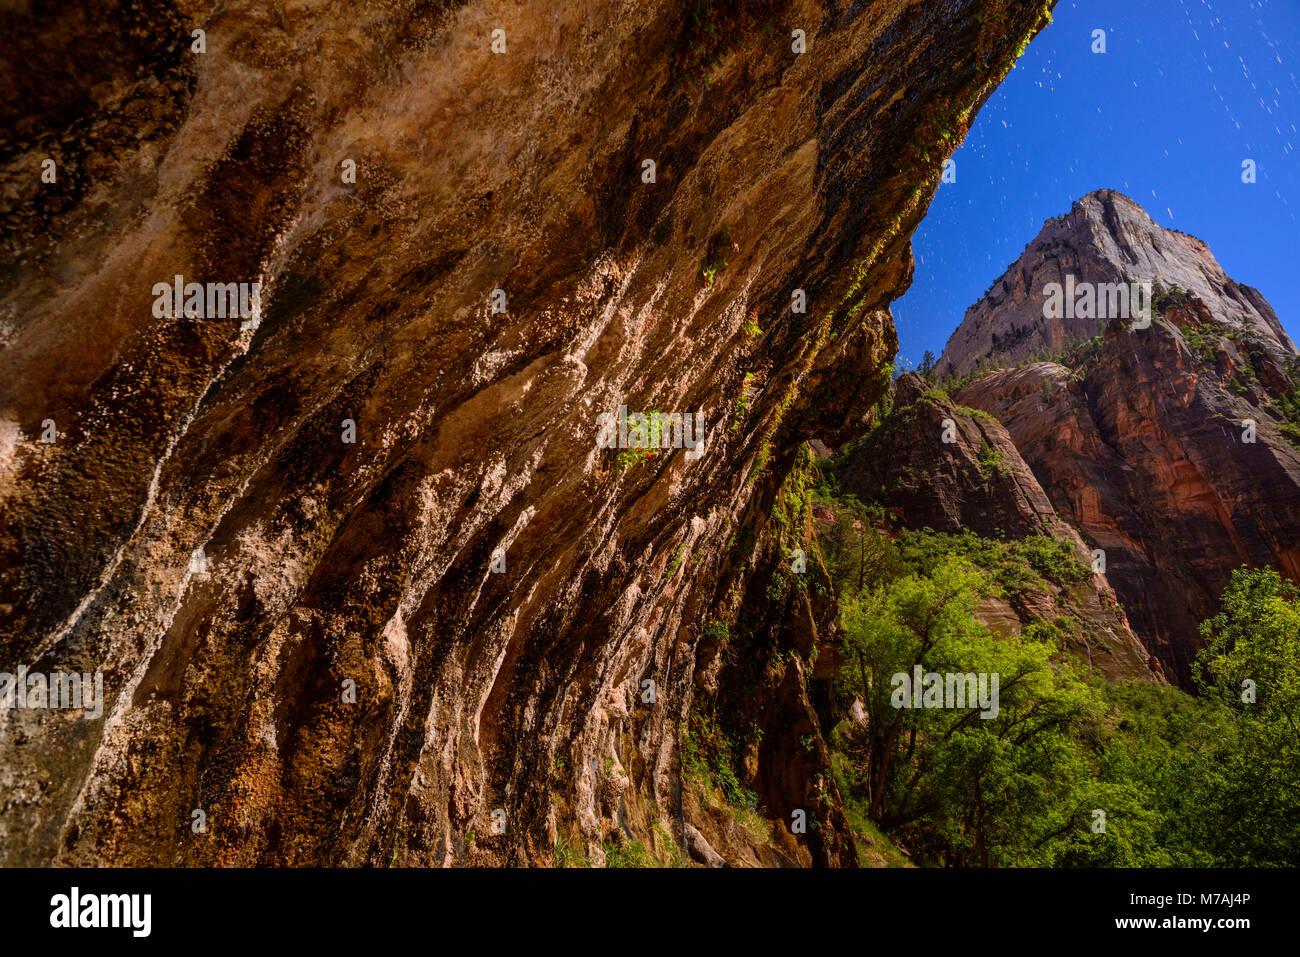 Les USA, Utah, Washington County, Springdale, Zion National Park, Zion Canyon de weeping rock, Photo Stock